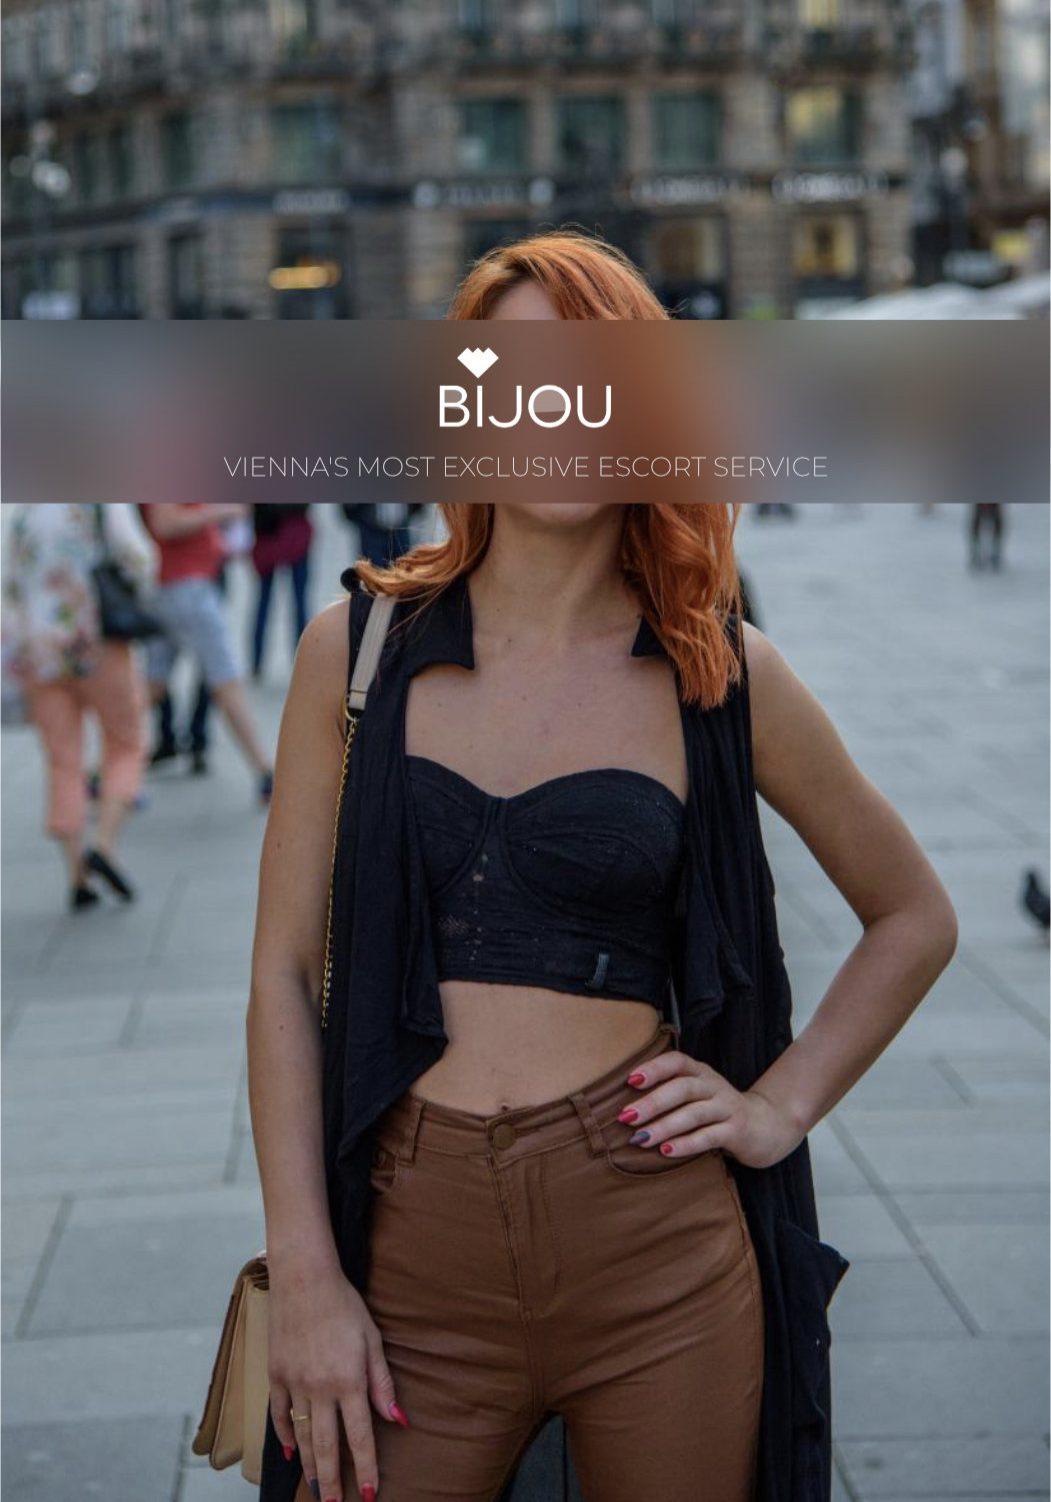 Bijou 3 daisy